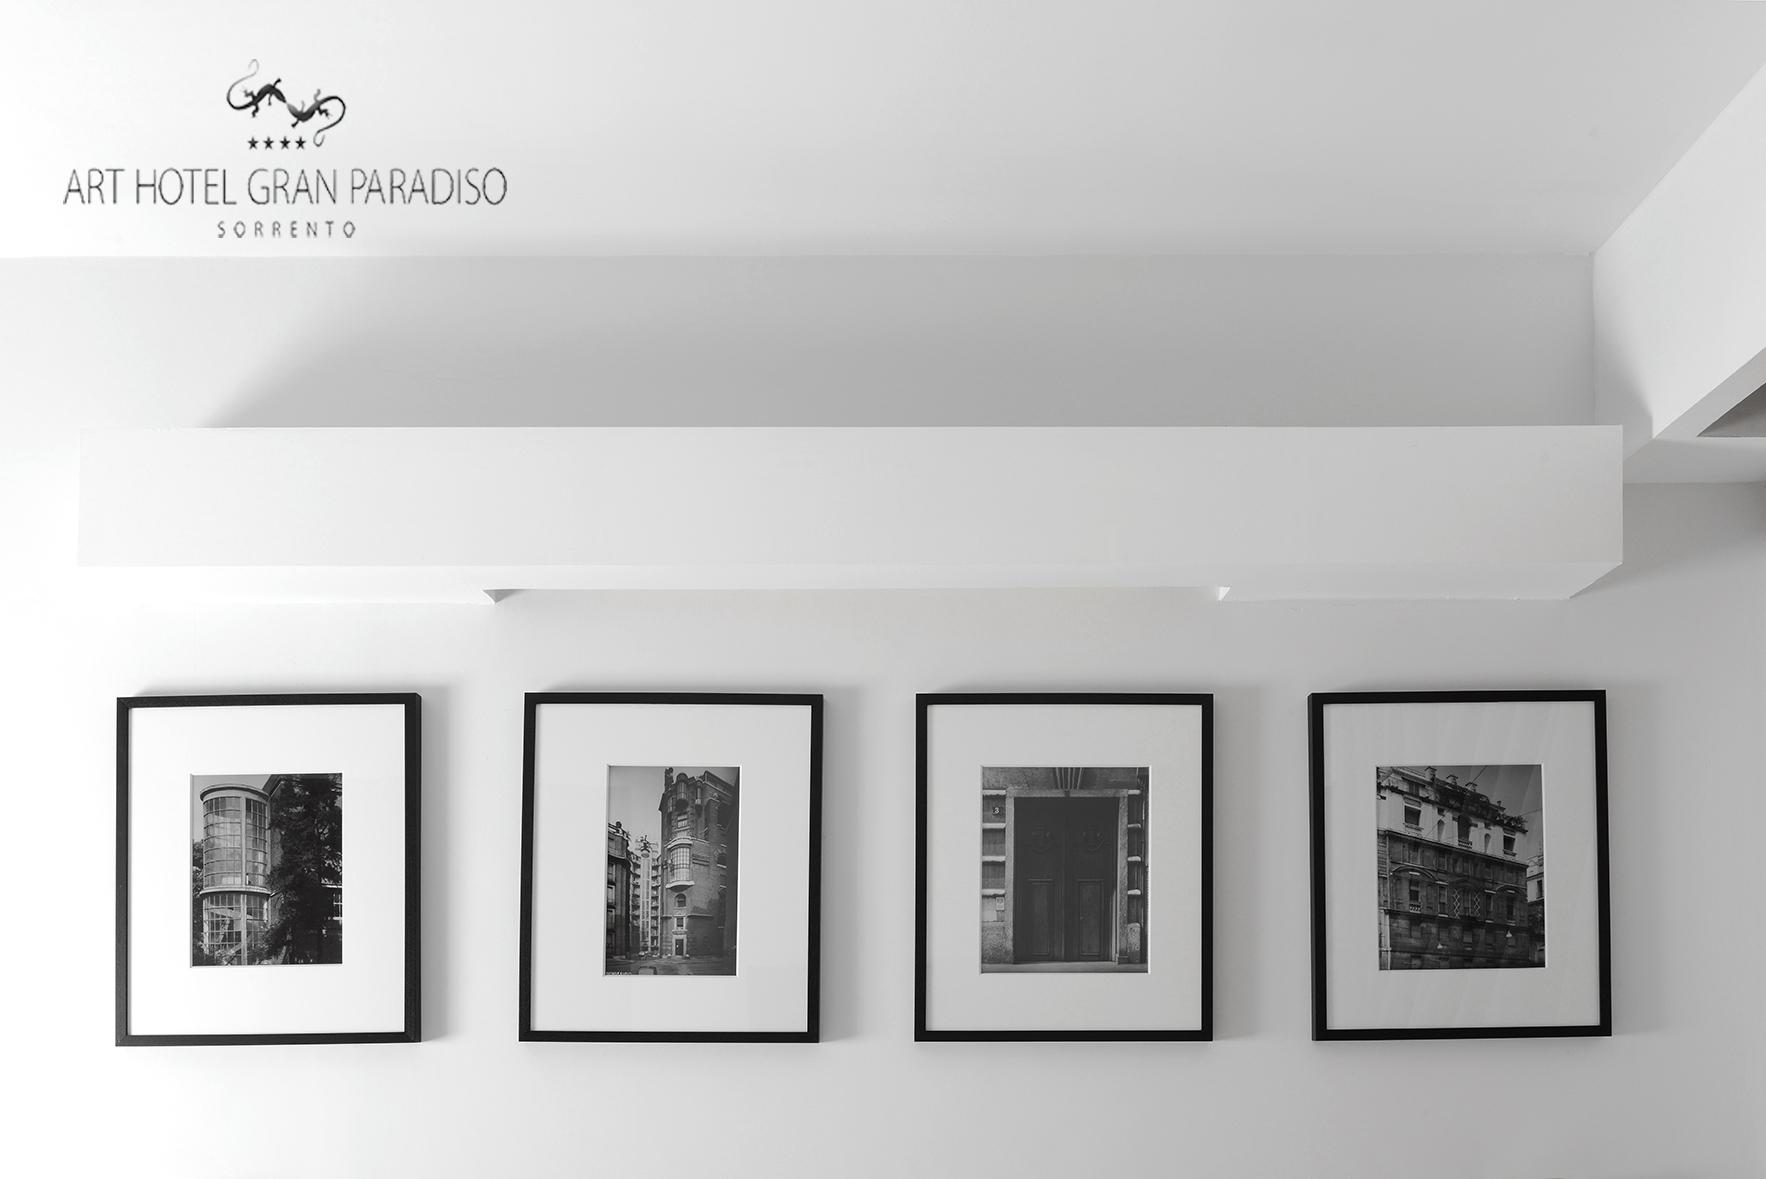 Art_Hotel_Gran_Paradiso_2013_316_Gabriele_Basilico_1.jpg